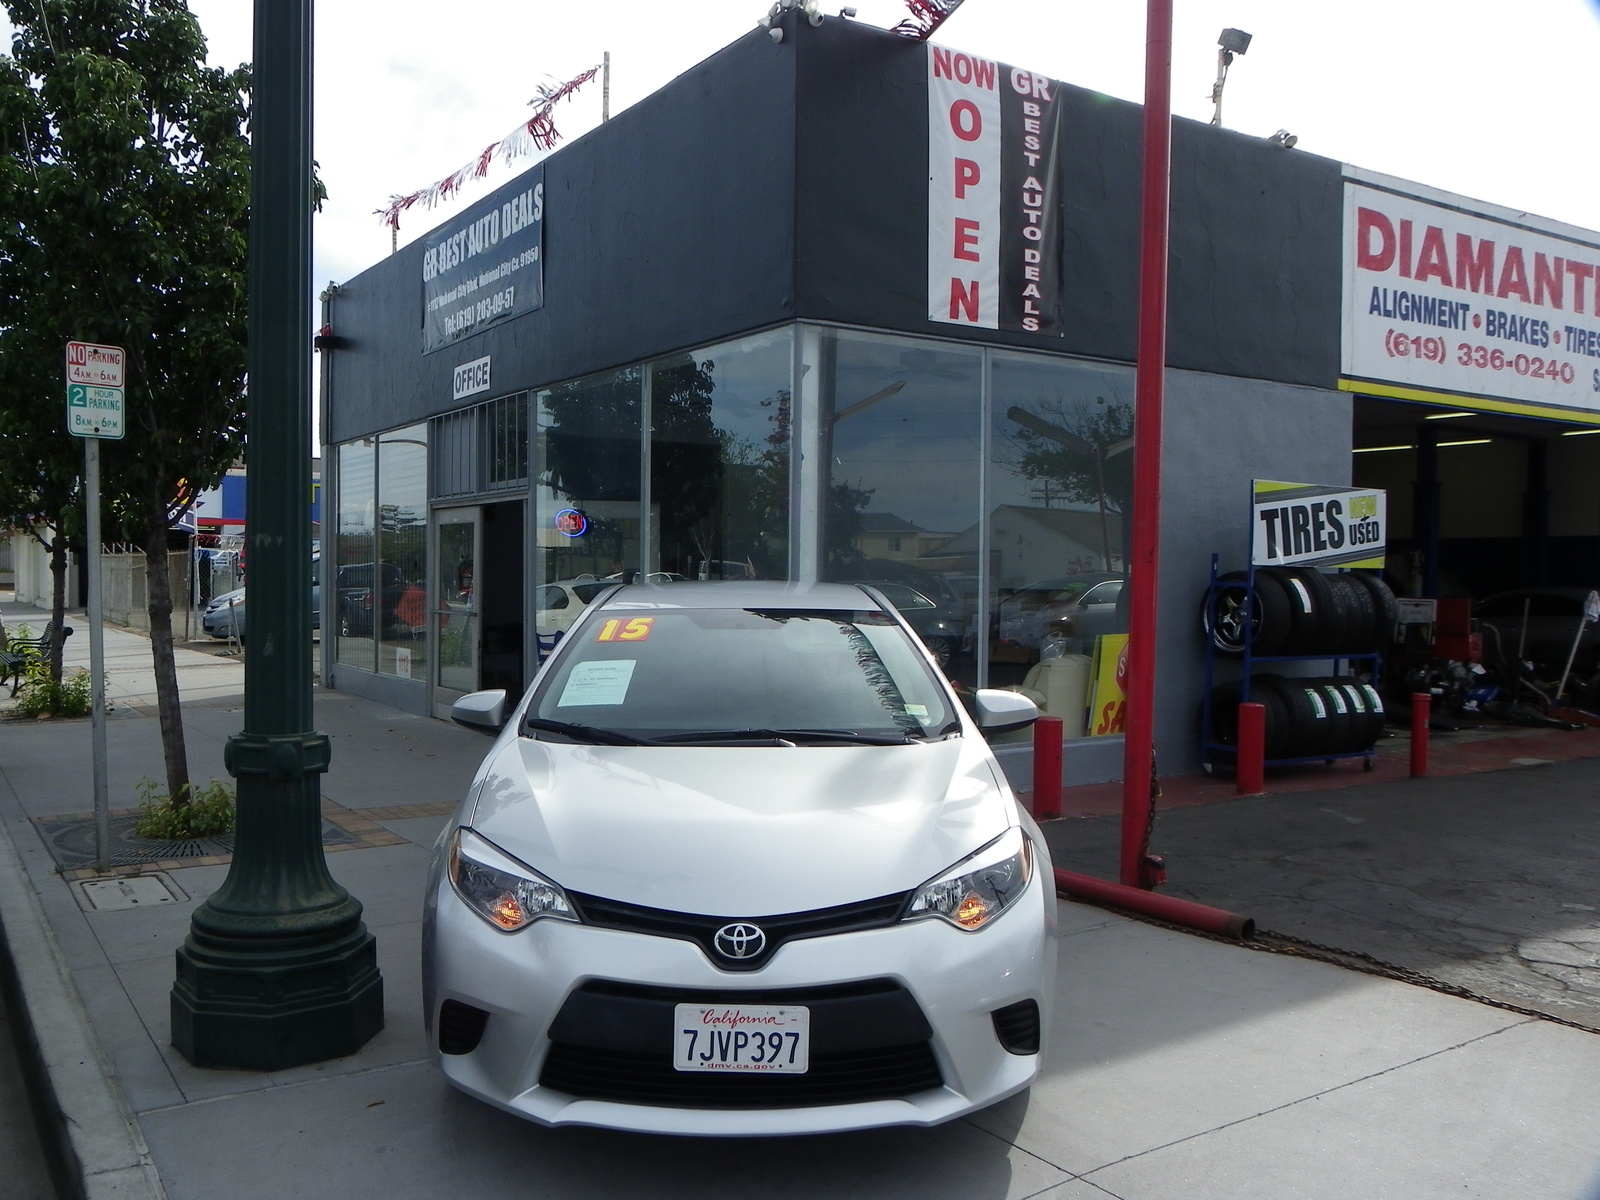 Best Auto Deals >> Gr Best Auto Deals National City Ca Read Consumer